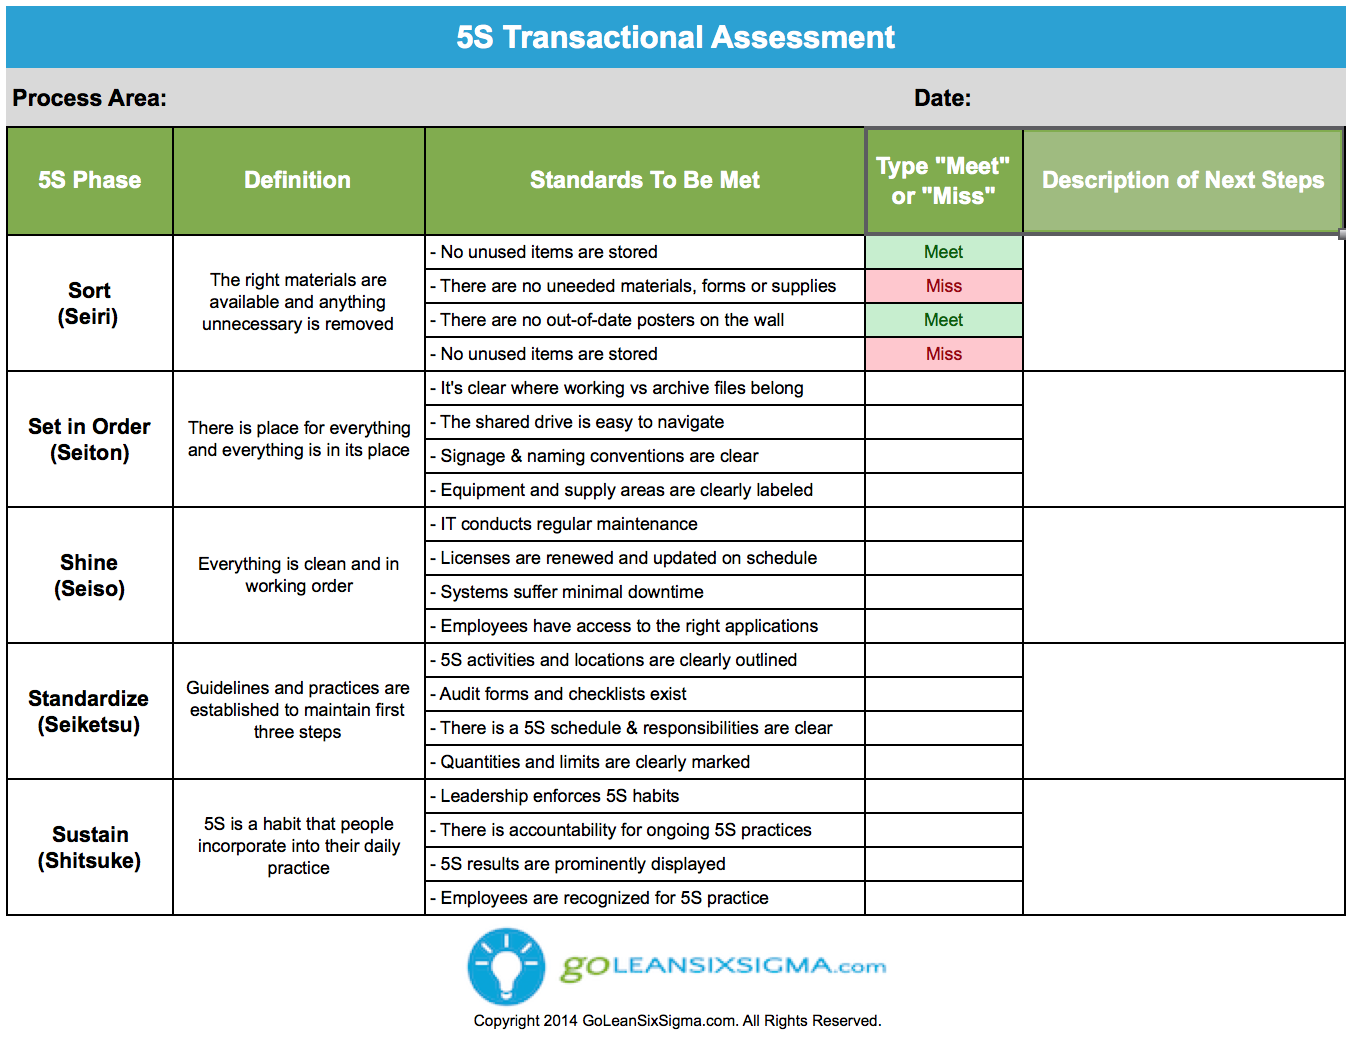 5S Transactional Assessment | Lean Six Sigma Templates ...